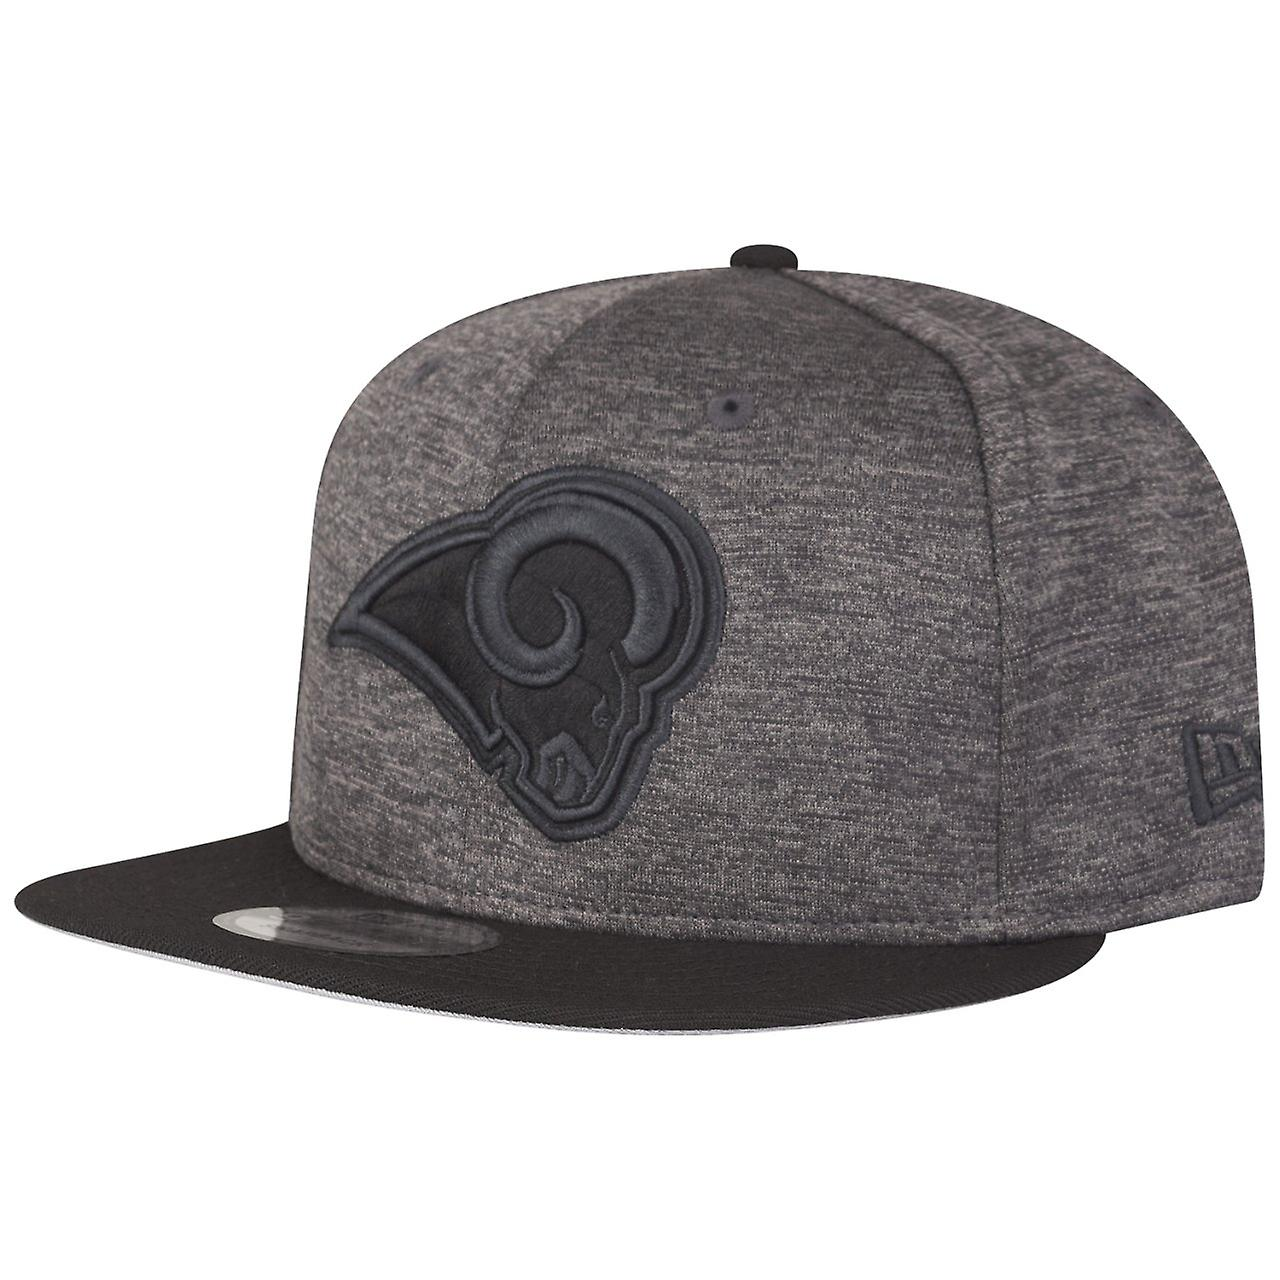 New Era 9Fifty Snapback Cap - SHADOW TECH Los Angeles Rams